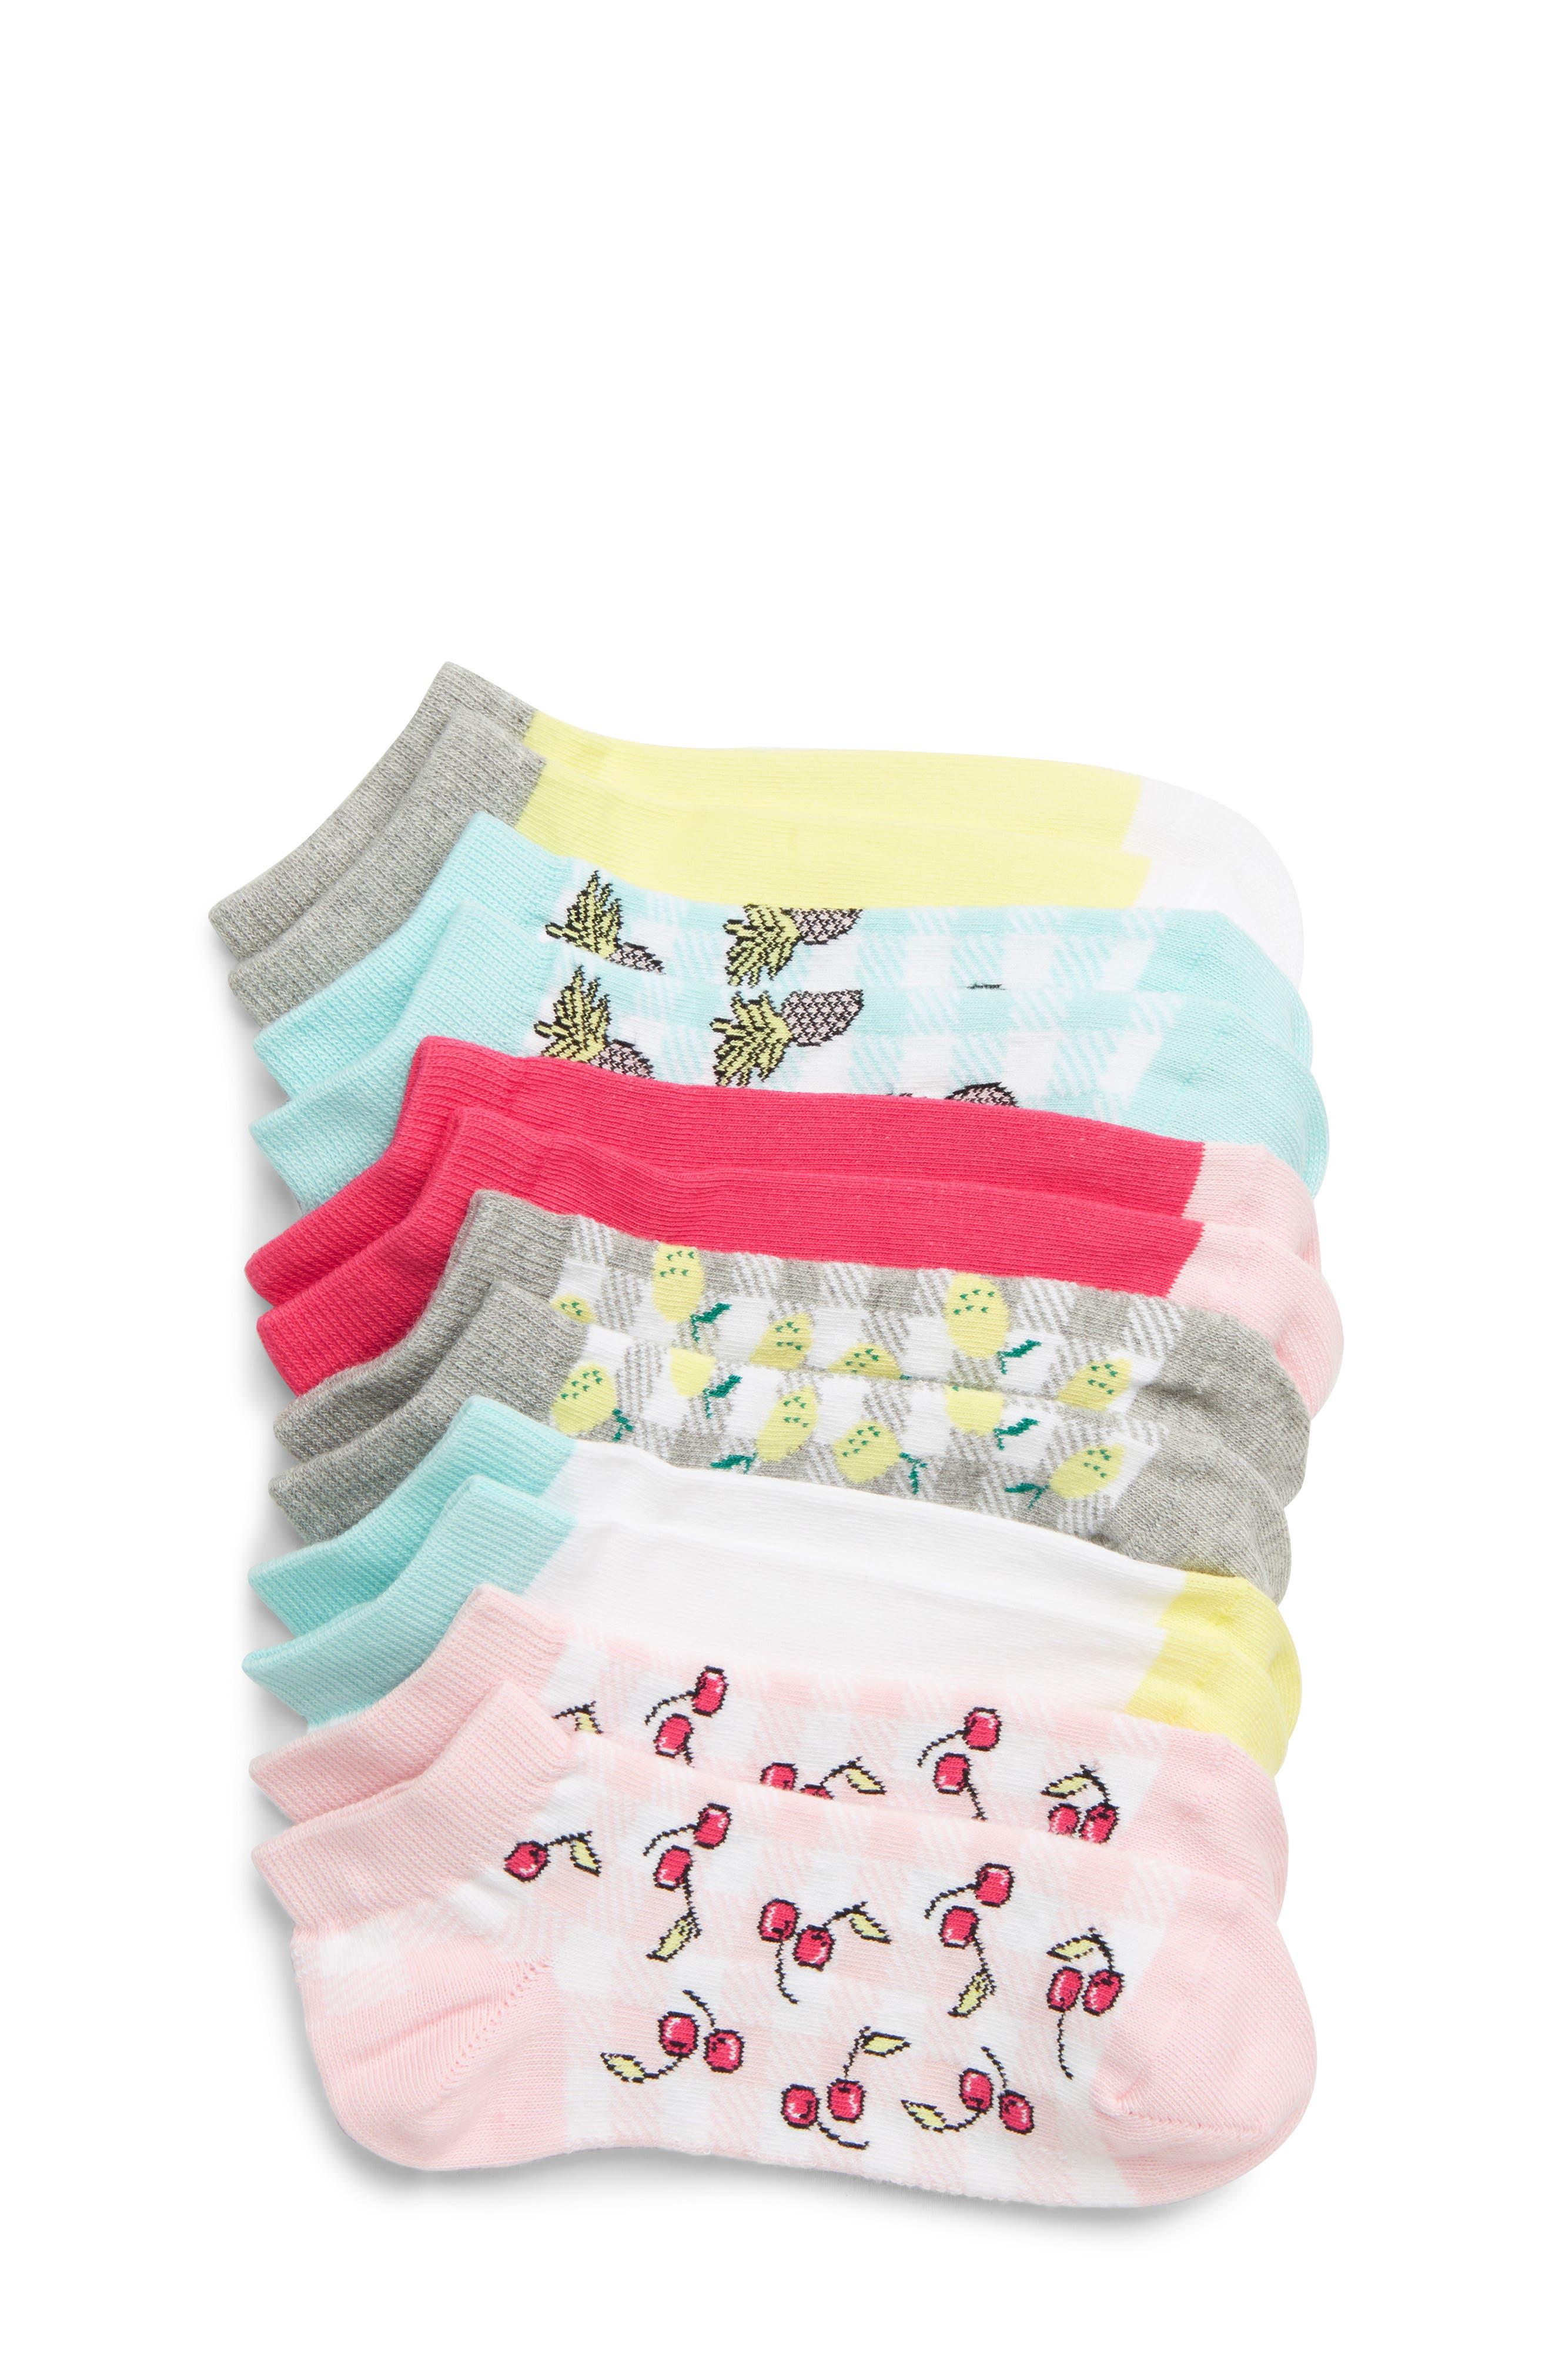 Toddler Girls Tucker  Tate 6Pack Ankle Socks Size 4585  Pink